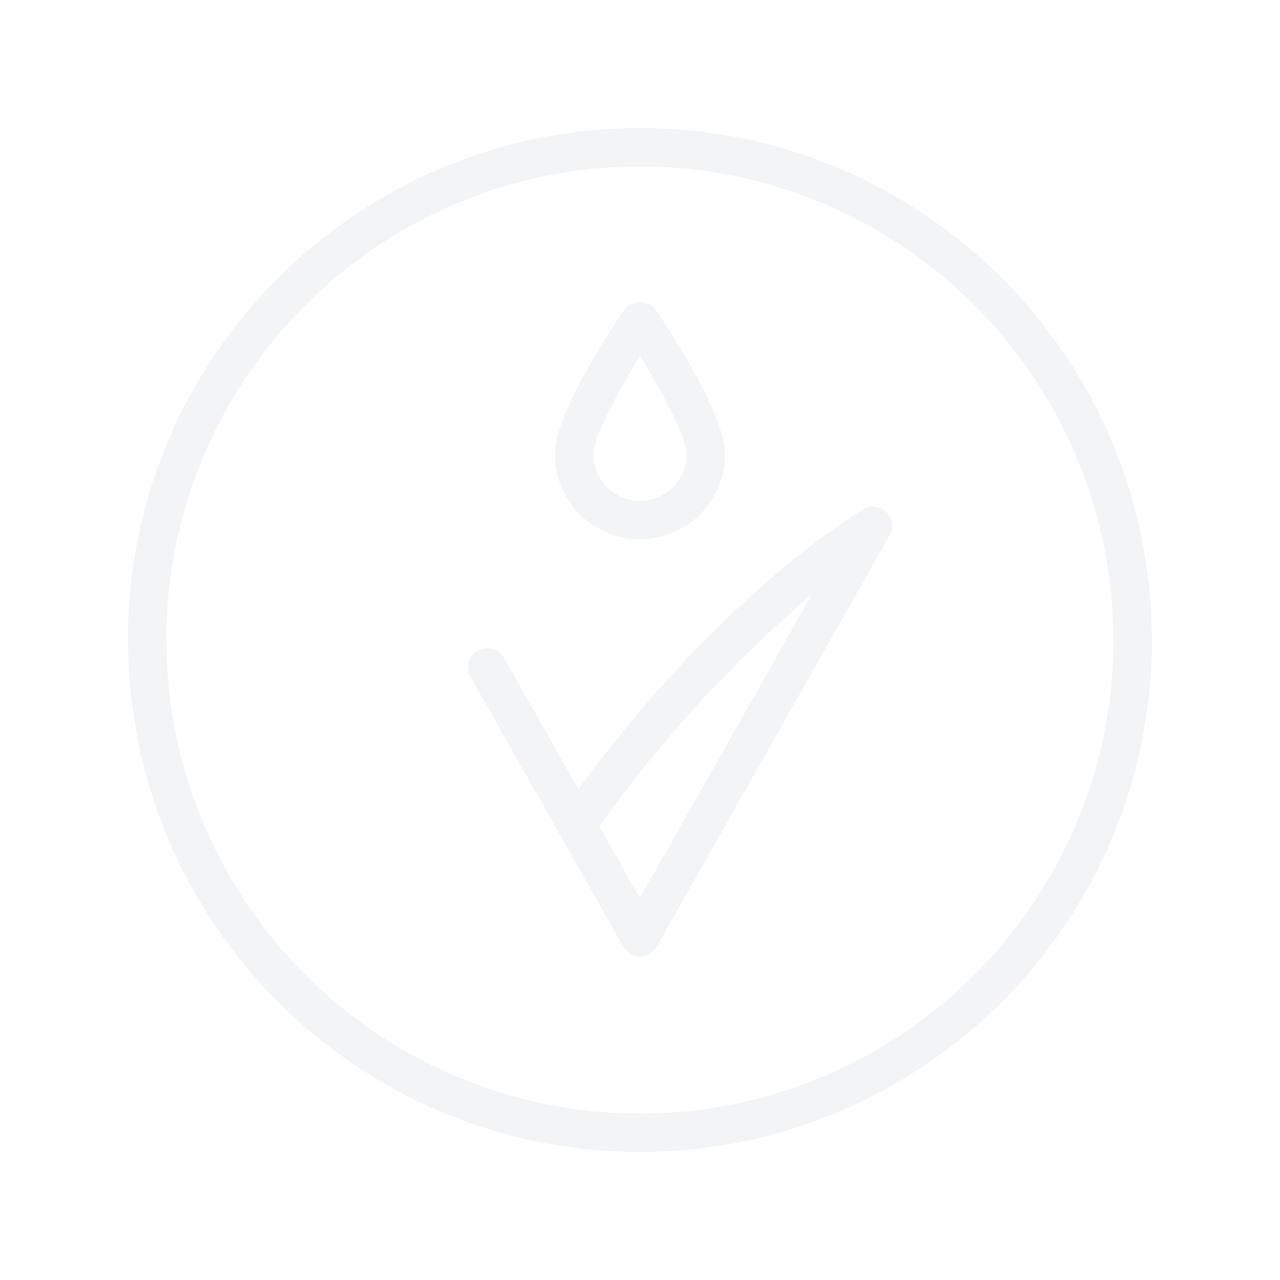 NATURA ESTONICA BIO Ginseng & Acai Face Cream 50ml